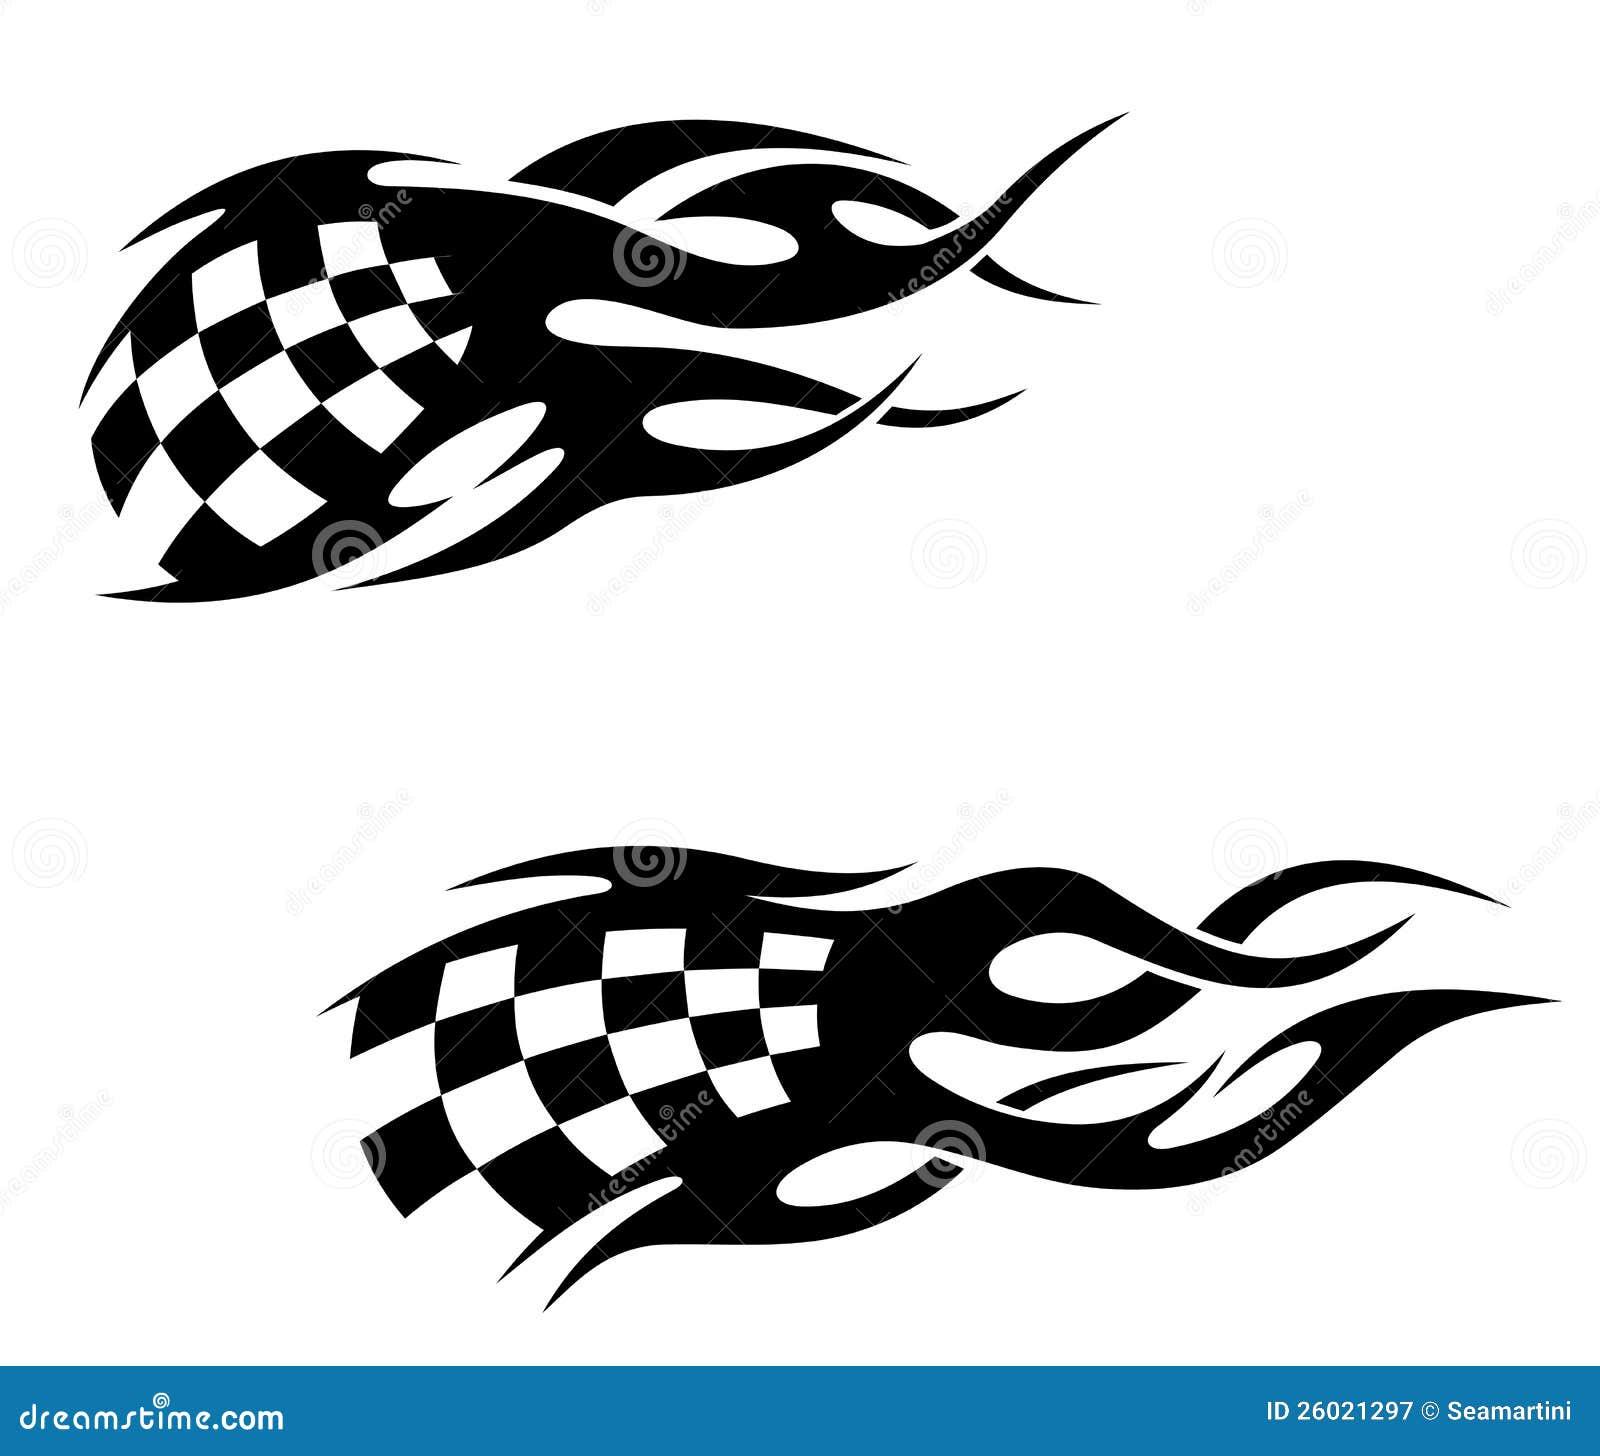 Tribal-Tattoos tribal-tattoos-checkuered-flag-26021297